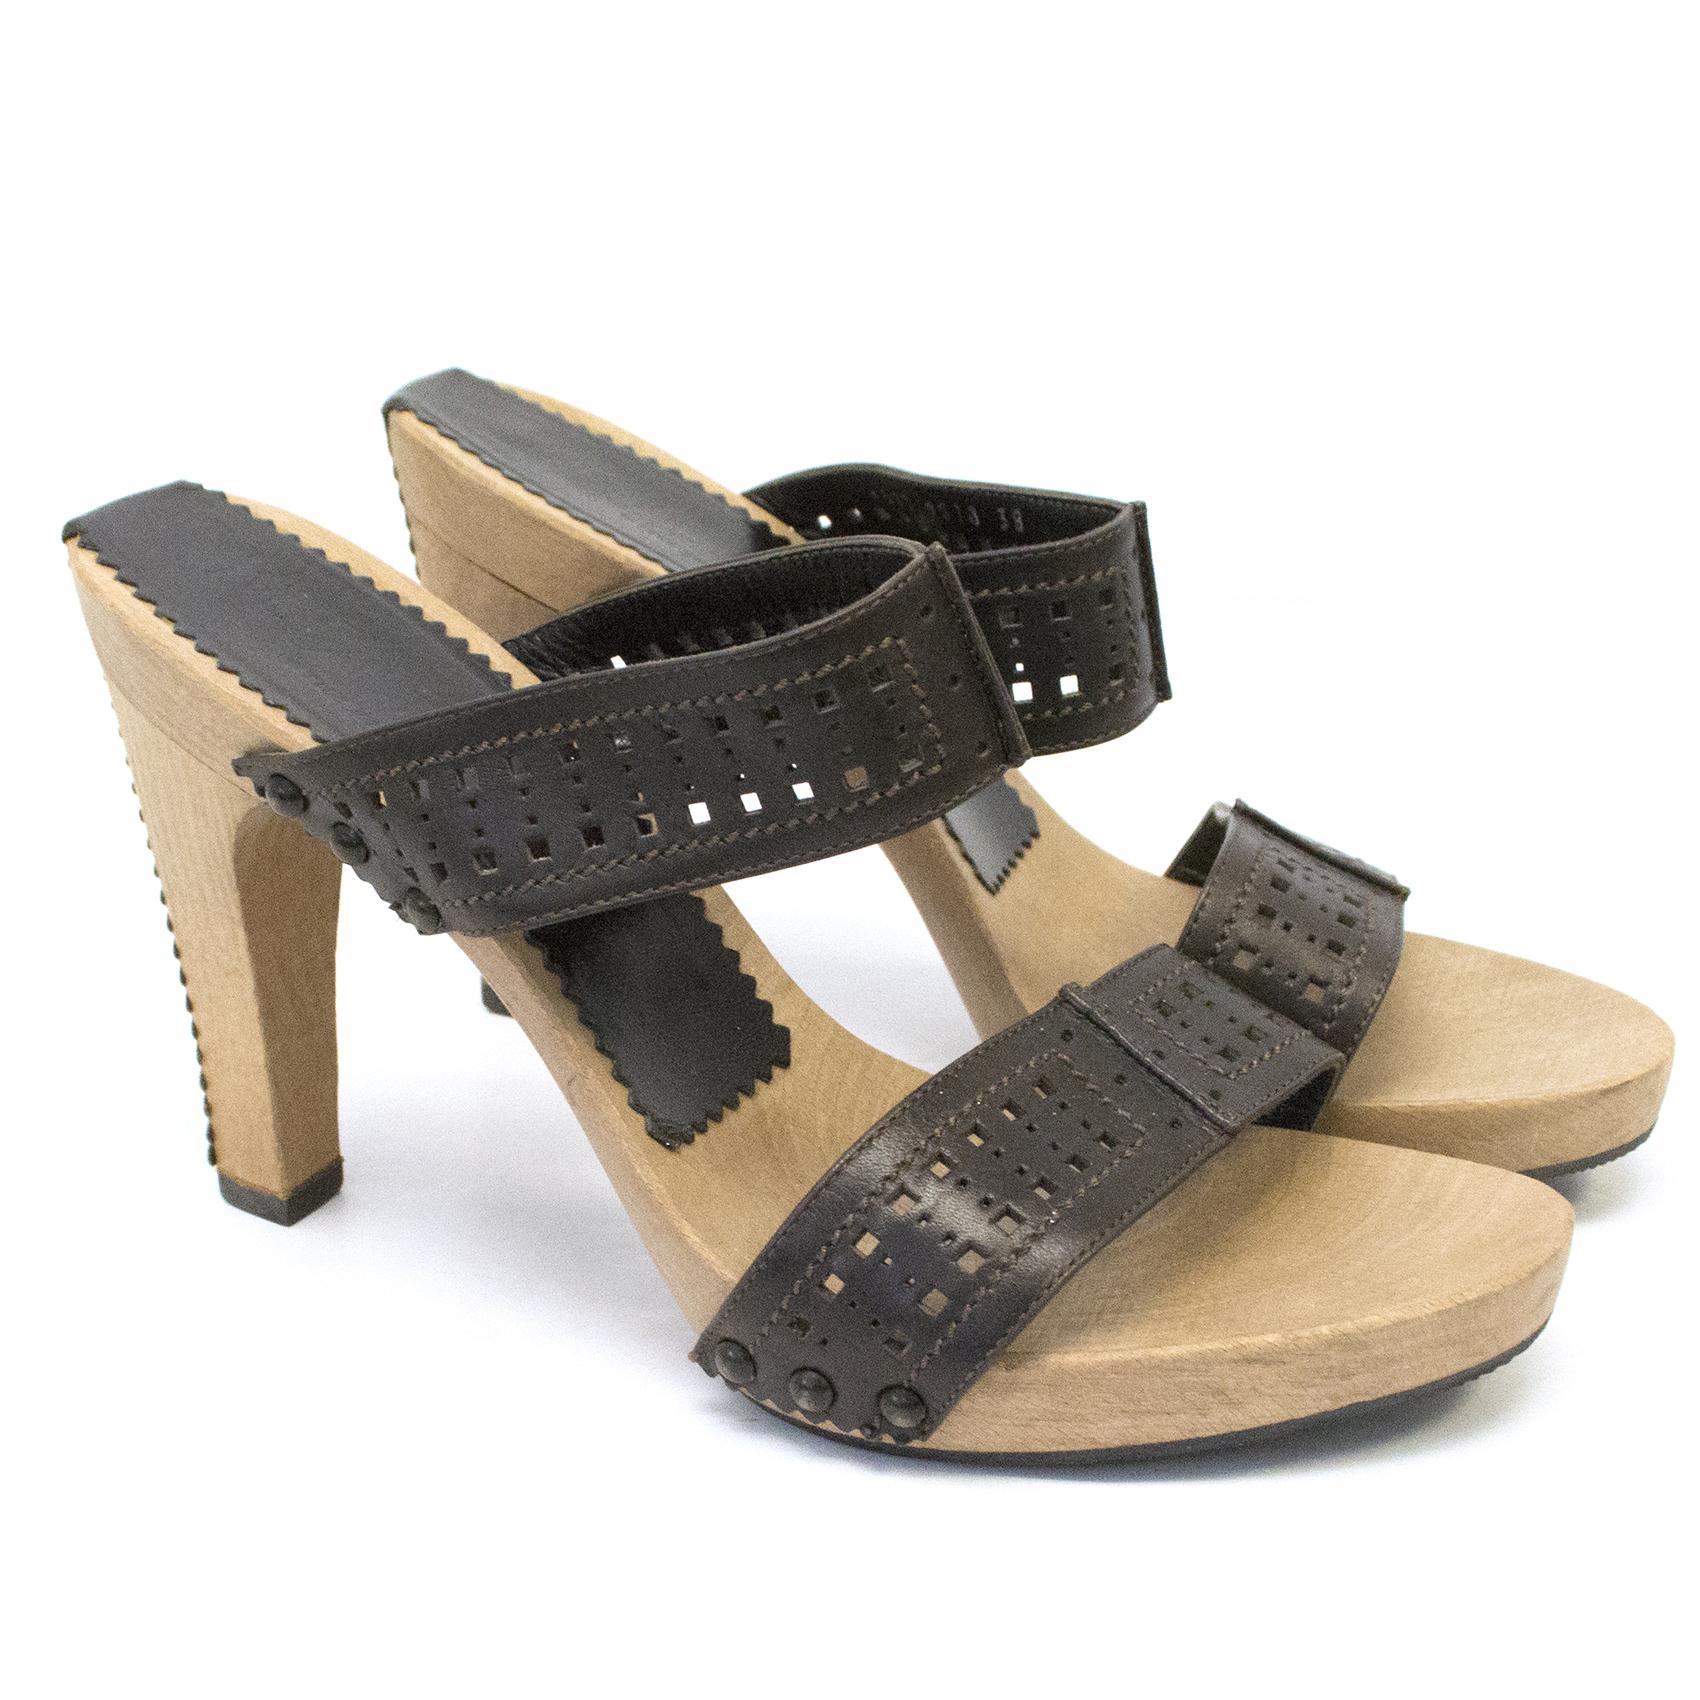 Yves Saint Laurent Brown Leather & Wood Heel Sandals